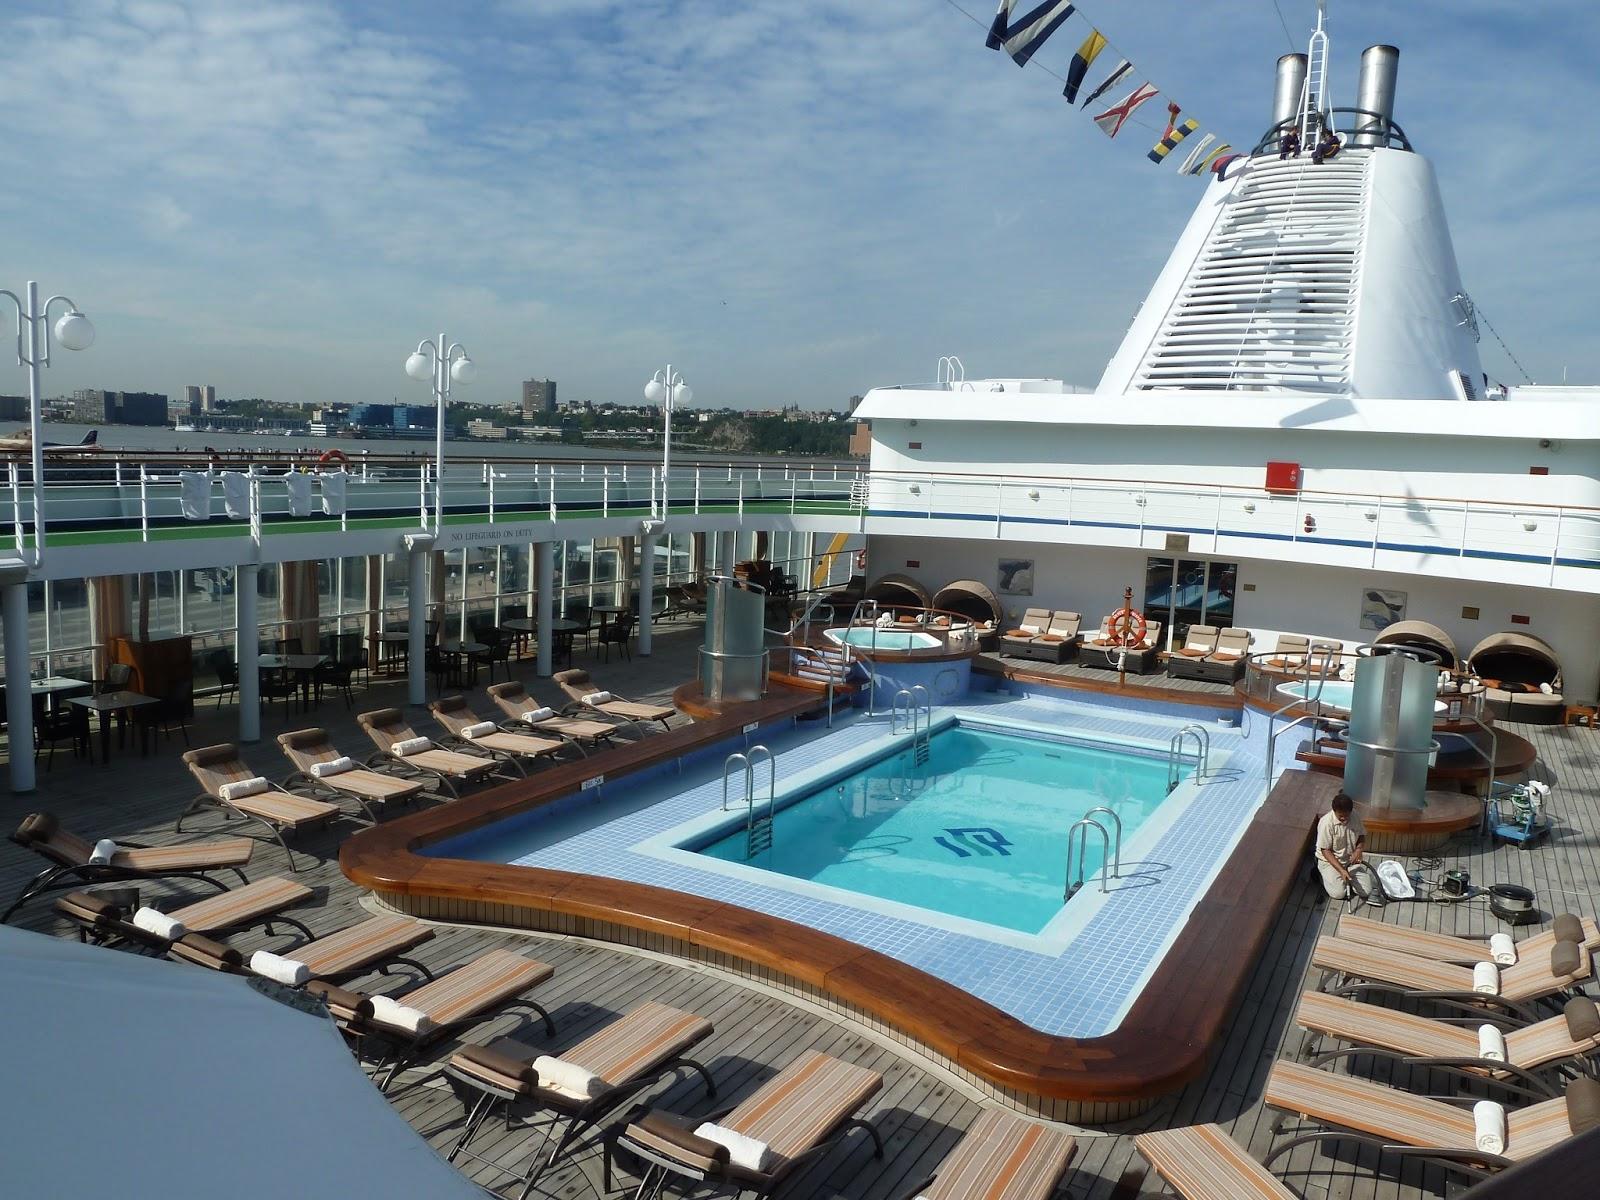 Silversea Silver Shadow Alaska Cruise Review Part I Goldring - Silver shadow cruise ship itinerary